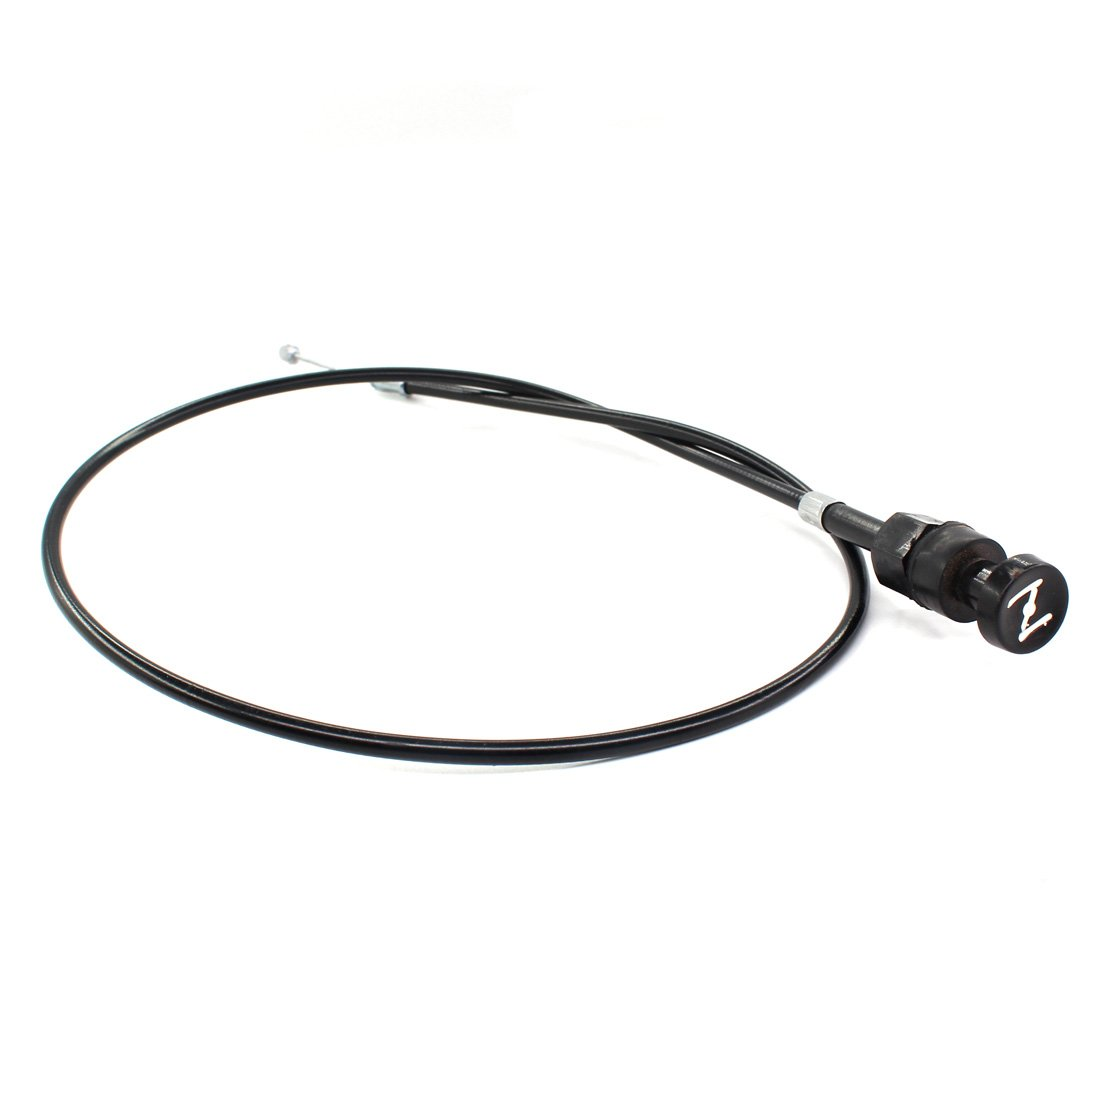 USPEEDA Push Pull Choke Cable for Yamaha XVS650 V Star 650 XVS650 XVS650A 1998-2010